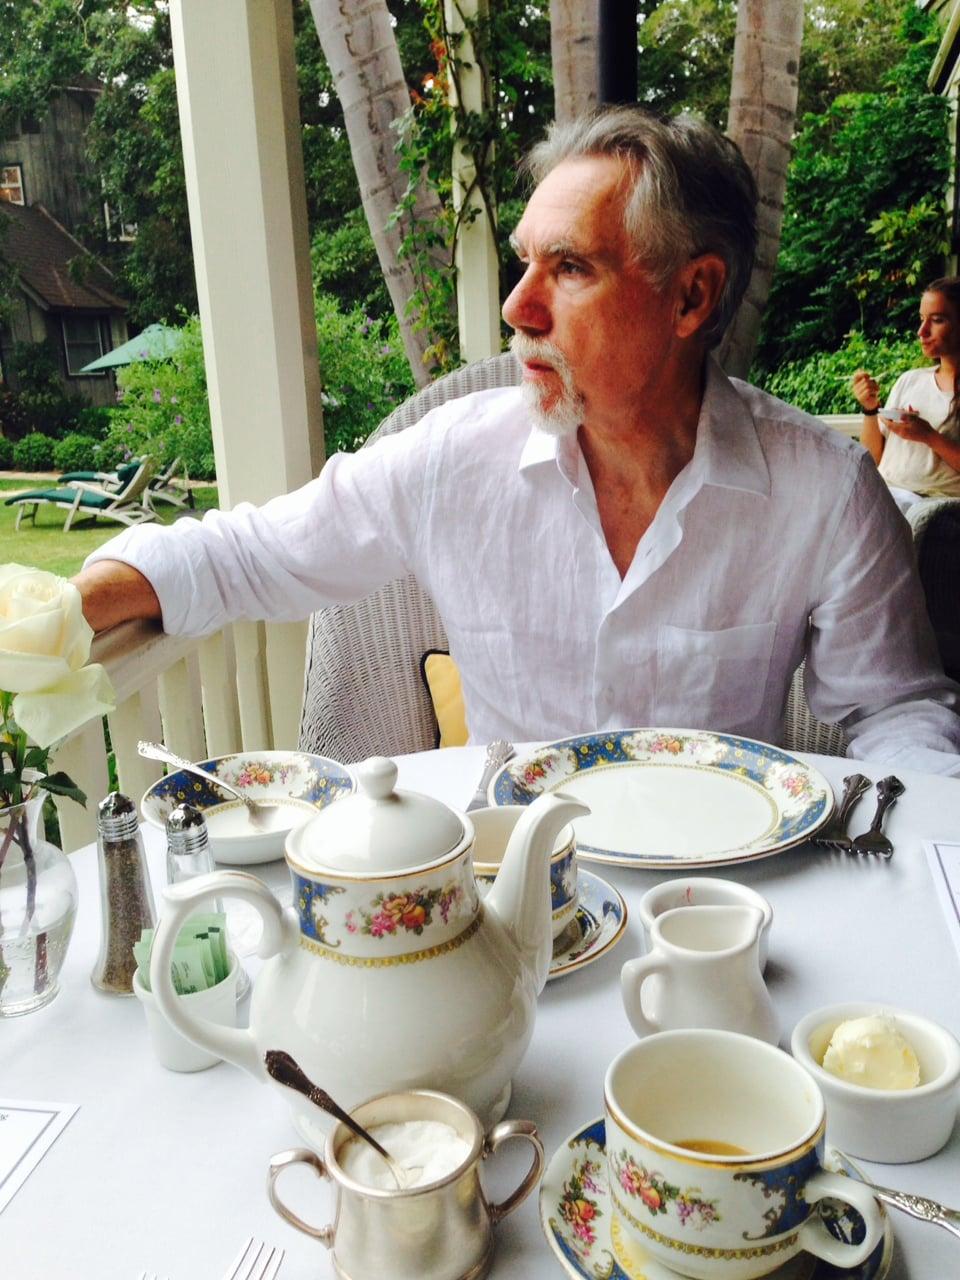 Martin enjoying tea on the veranda of the  Simpson House Inn